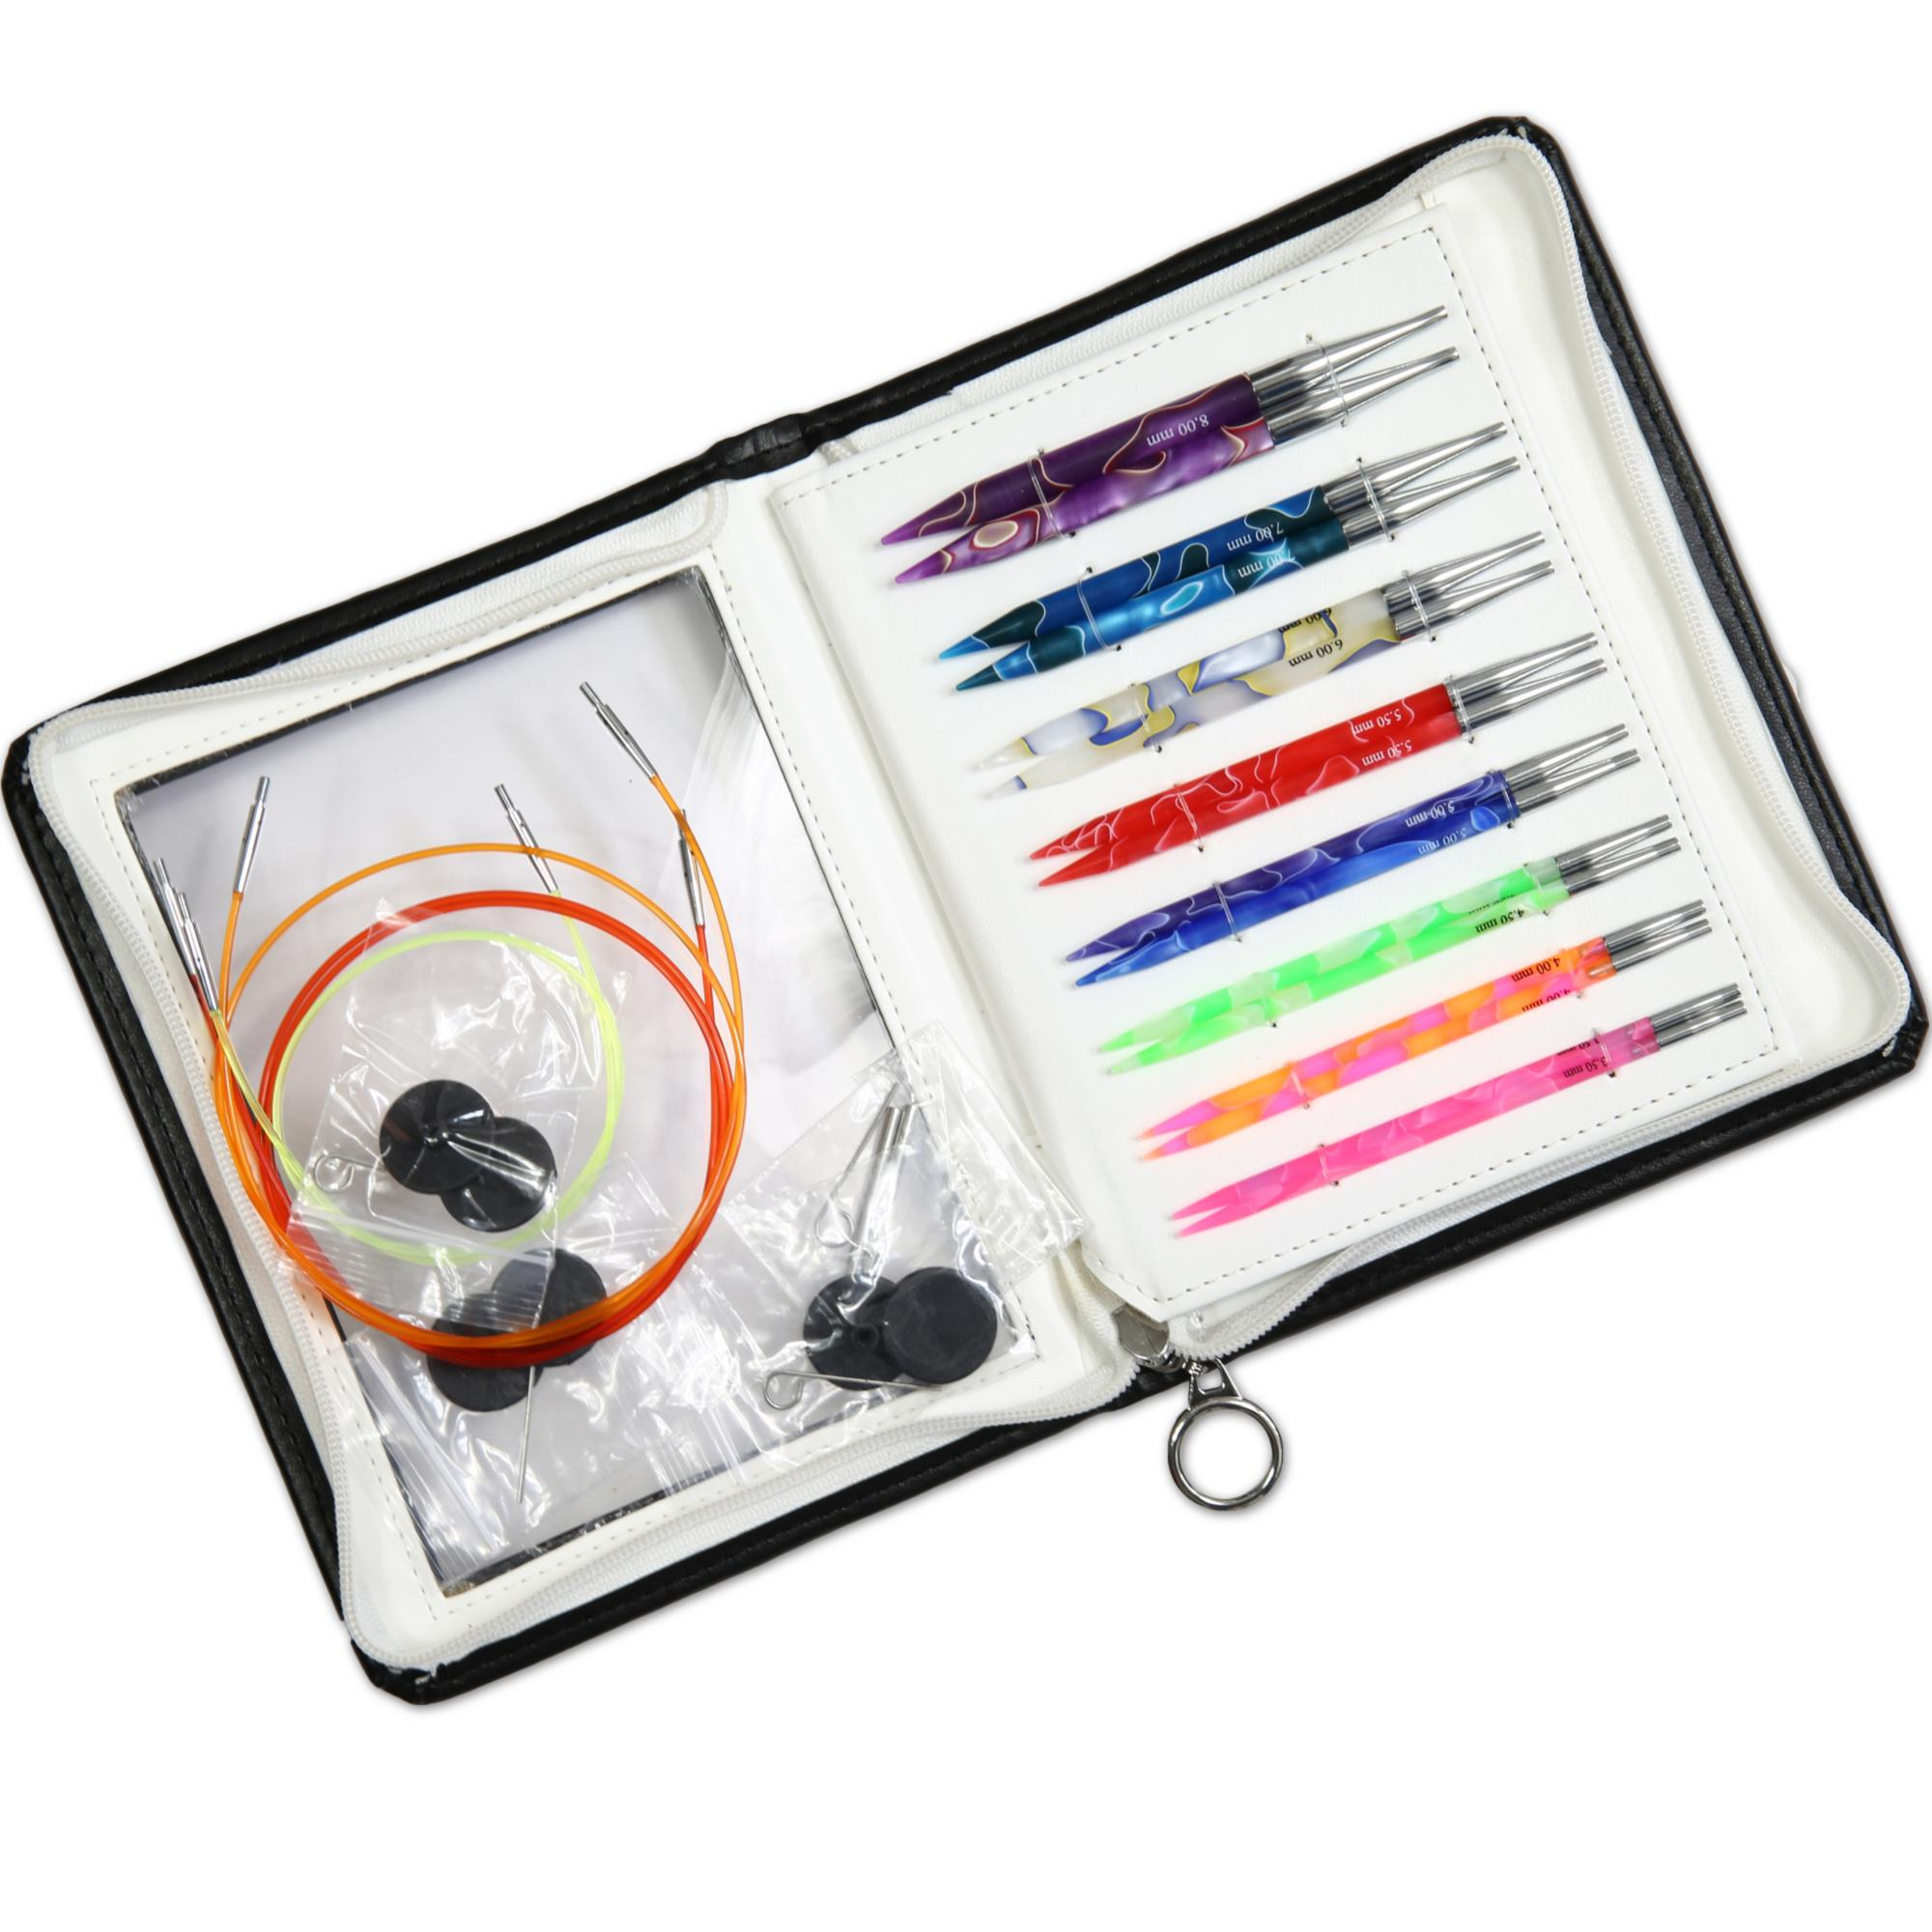 71506 Набор съемных спиц Marblz Deluxe KnitPro 3